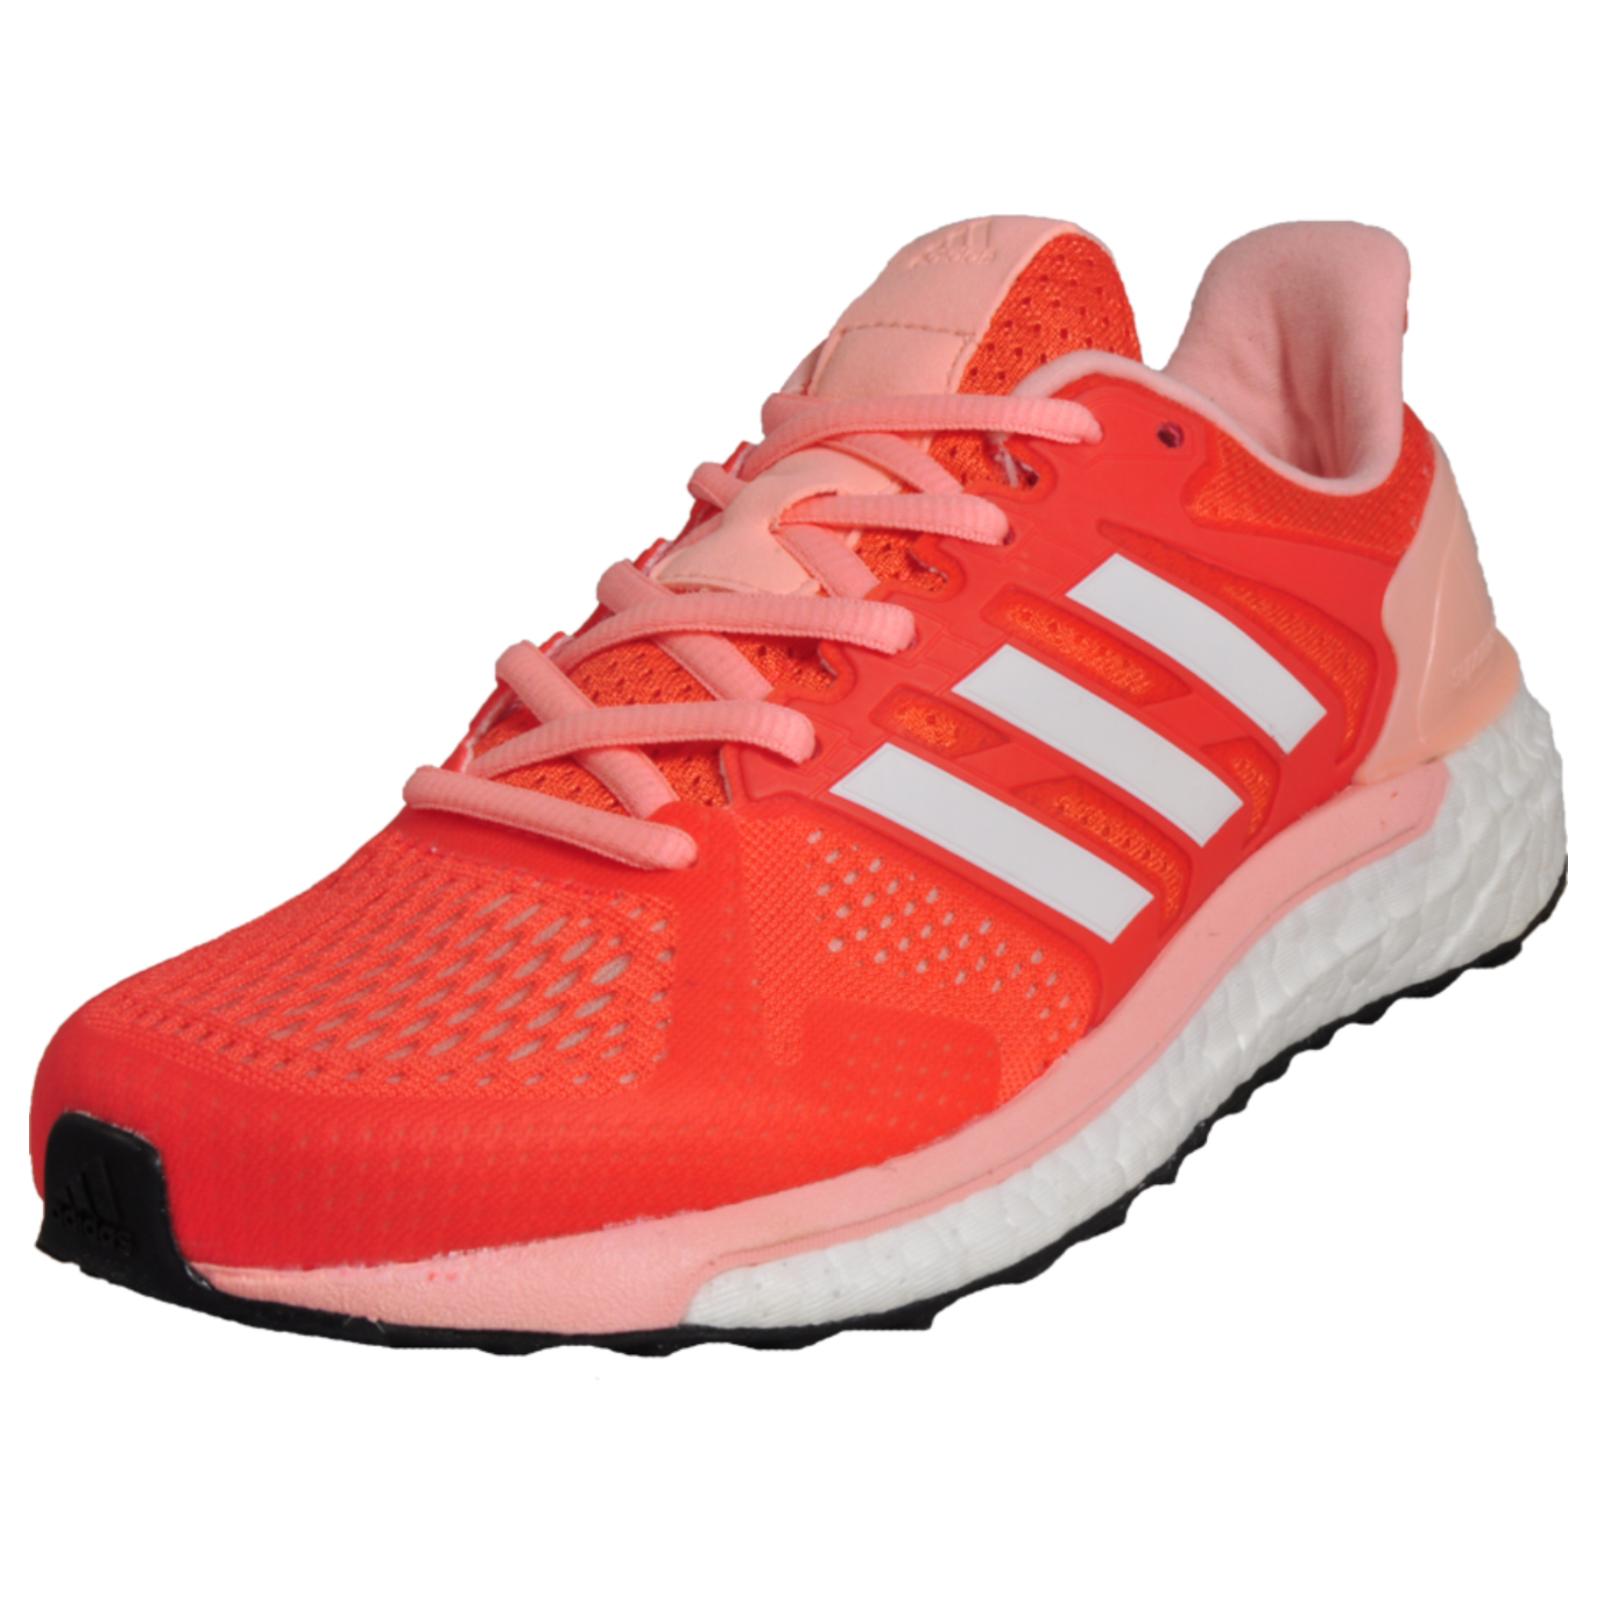 Adidas Supernova ST Boost Womens Premium Running Shoes Big